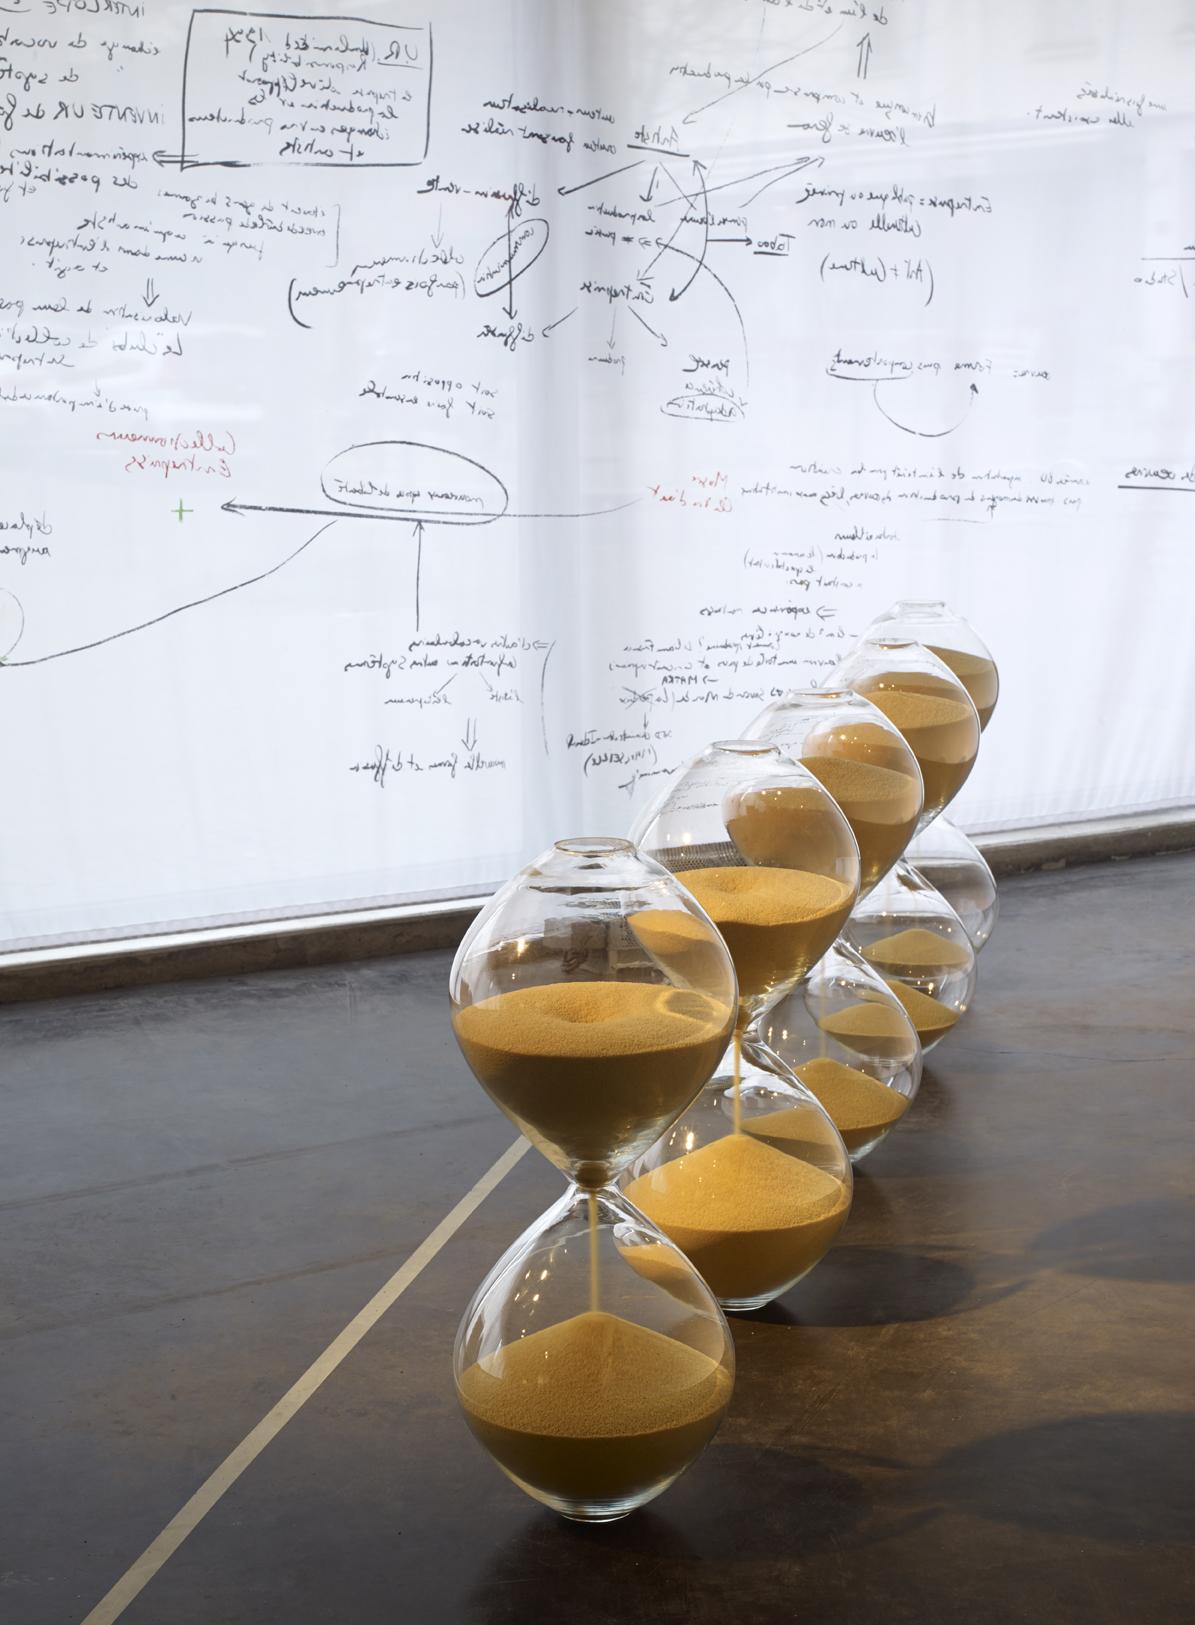 Mehdi-Georges Lahlou,  The Hourglasses, Detail, mold-blown glass, couscous 73 x 30 x 30 cm, 2015 - Courtesy the artist and Rabouan Moussion Gallery Paris